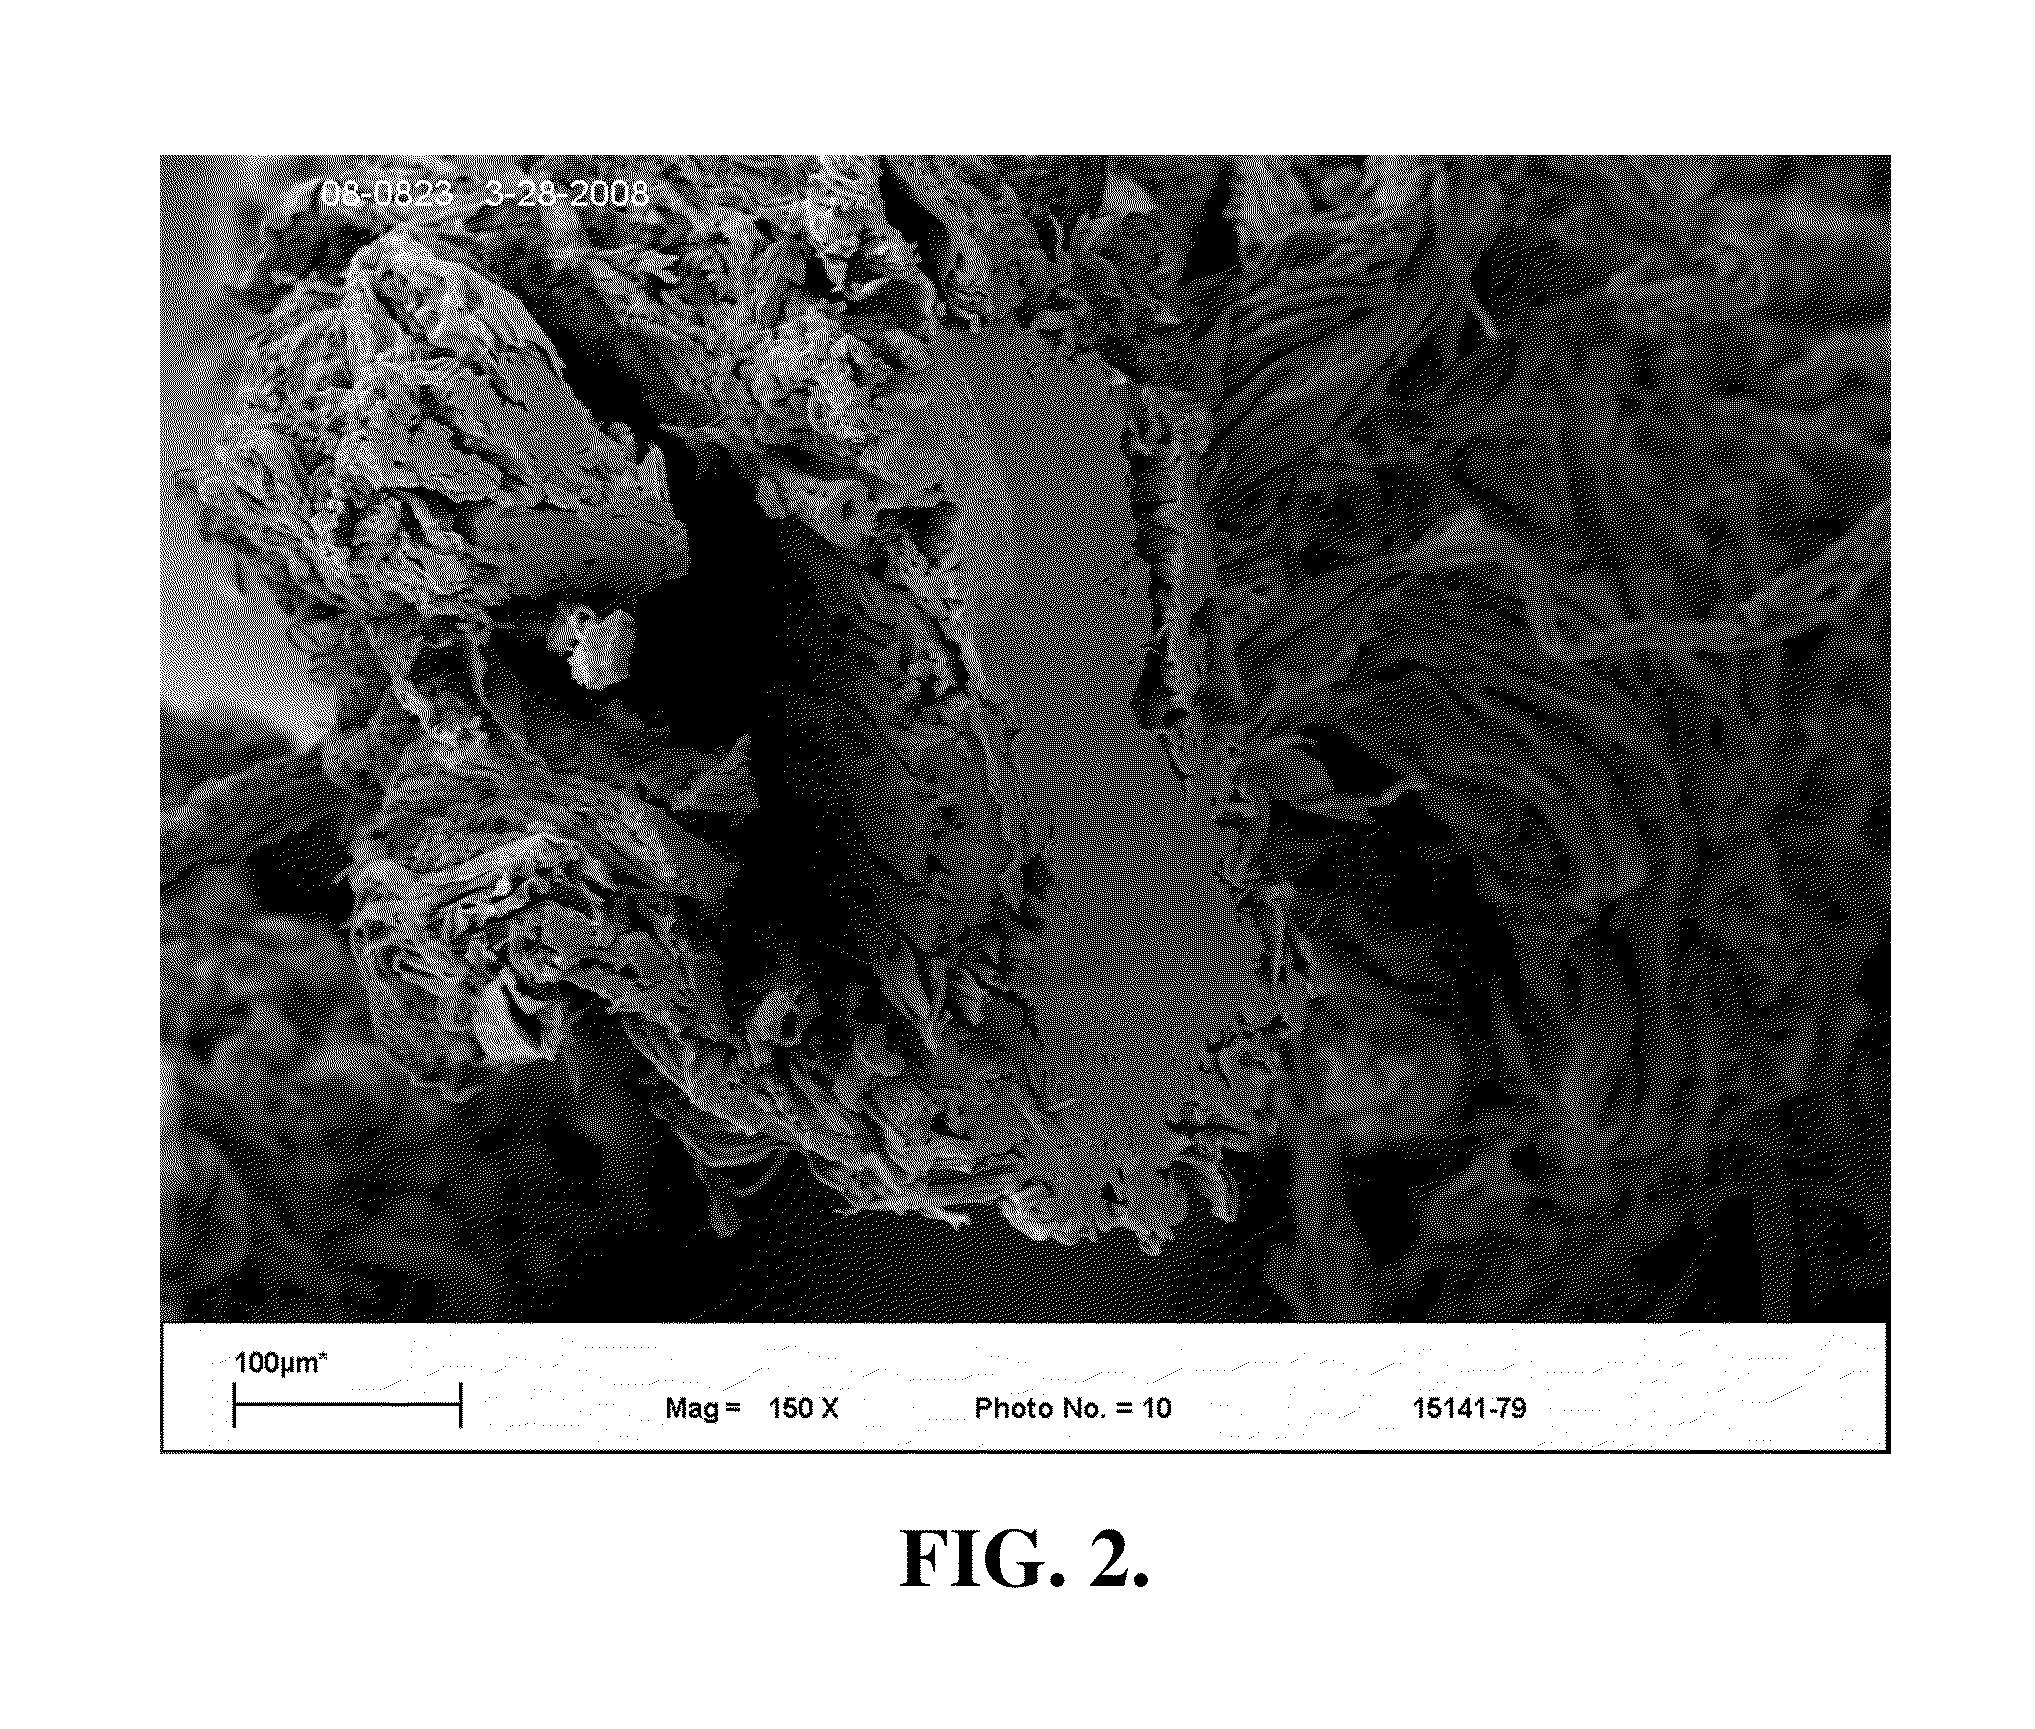 cook composites and polymer Part one introduction to polymer composites polymer composites: volume 1, first edition edited by sabu thomas, kuruvilla joseph, sant kumar malhotra, koichi goda, and meyyarappallil sadasivan sreekala.